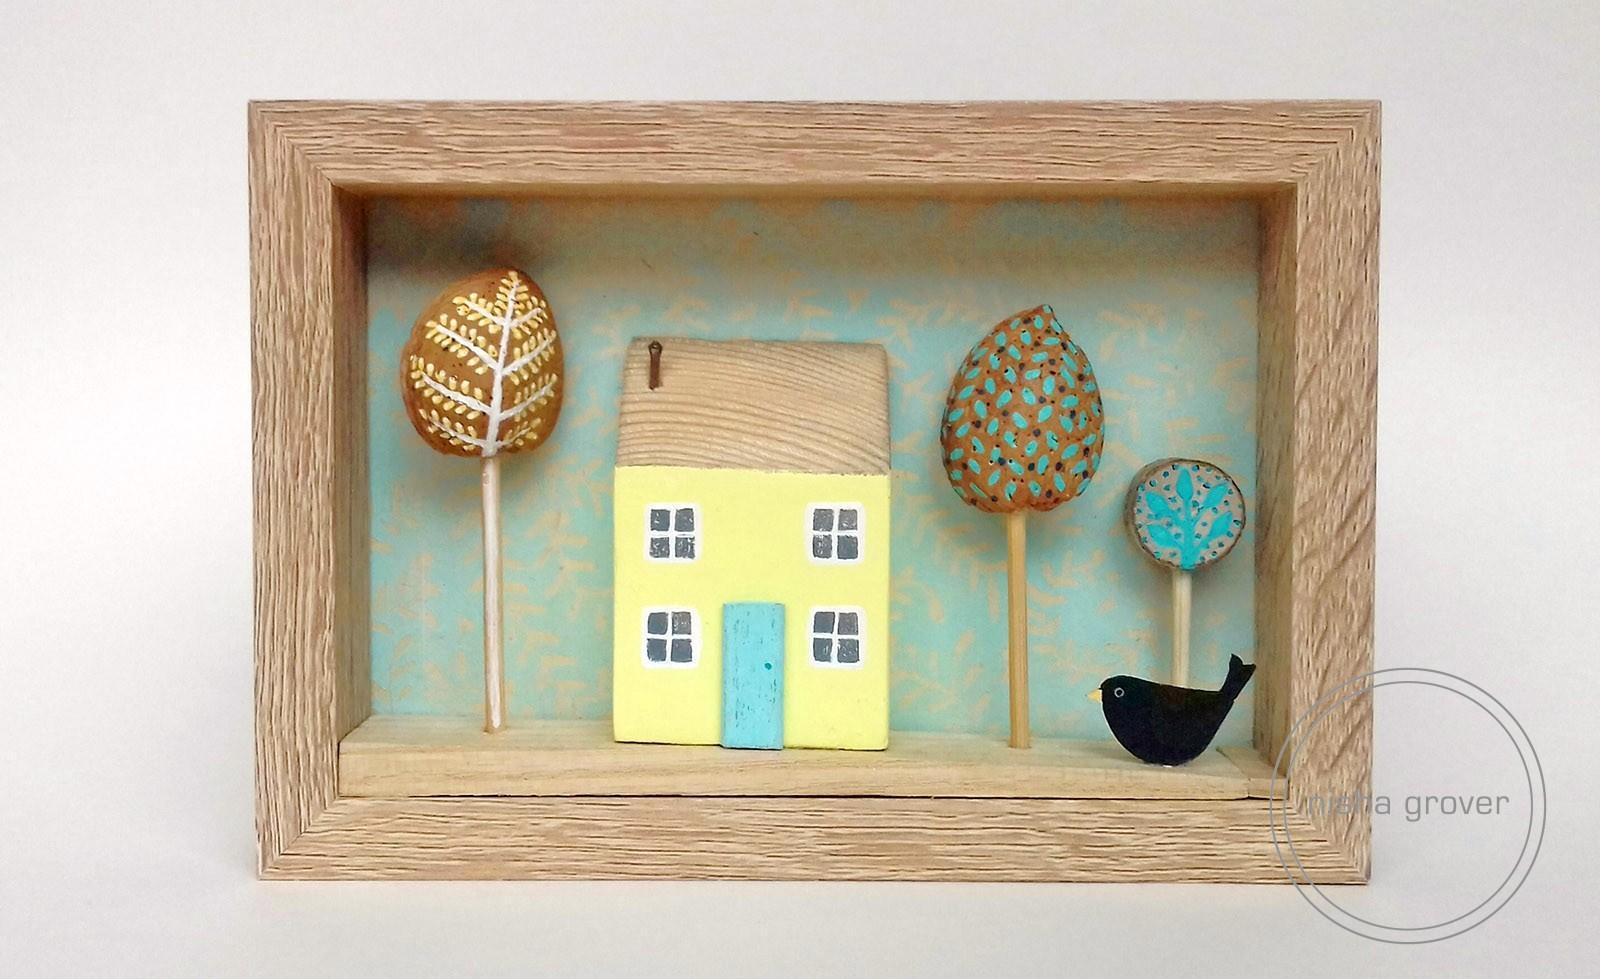 House in frame